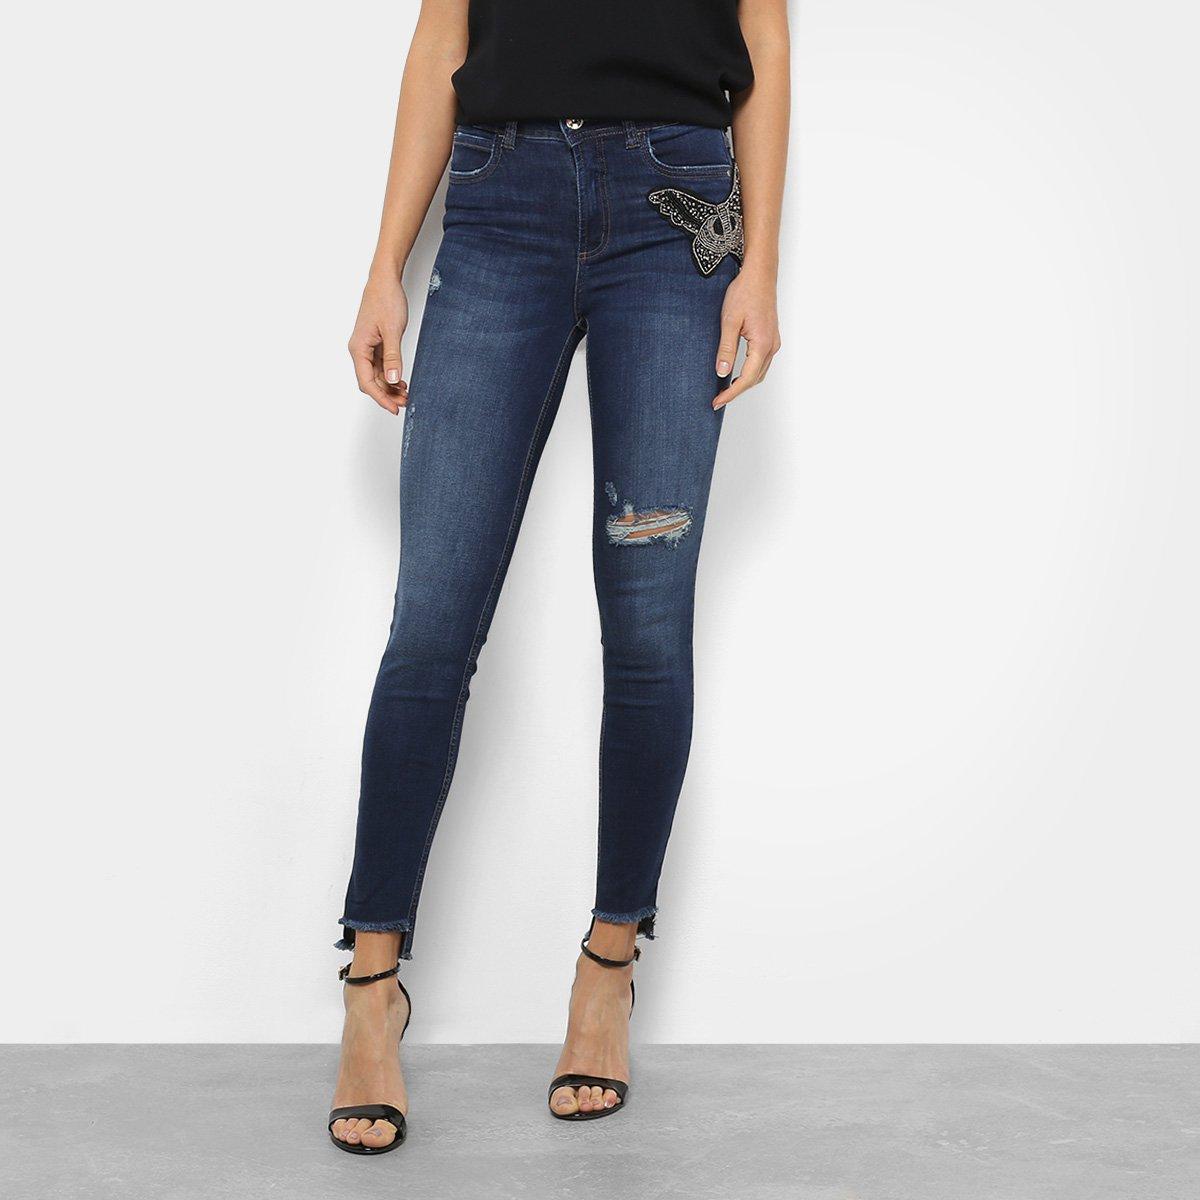 275014cb5 Calça Jeans Skinny Colcci Bia Bordada Manual Cintura Média Feminina